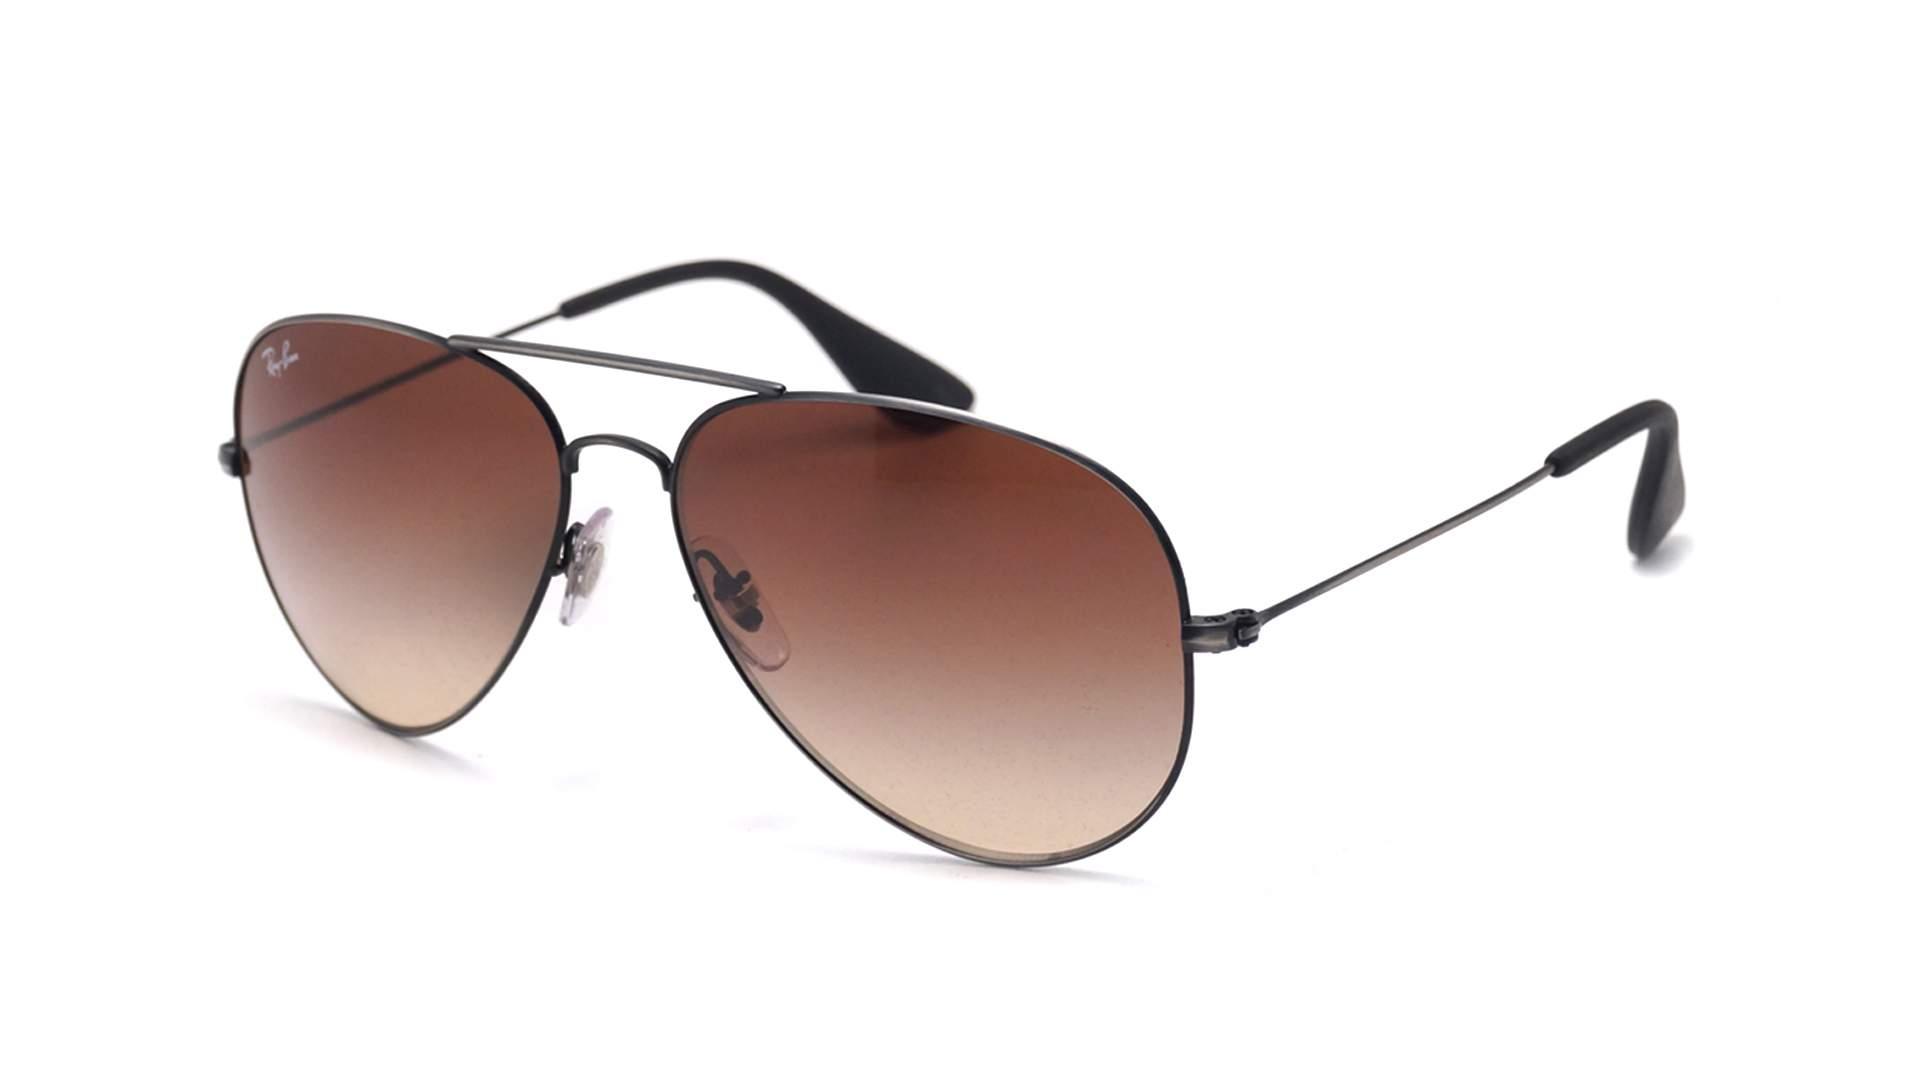 81da9e2123 Sunglasses Ray-Ban RB3558 913913 58-14 Black Matte Large Gradient